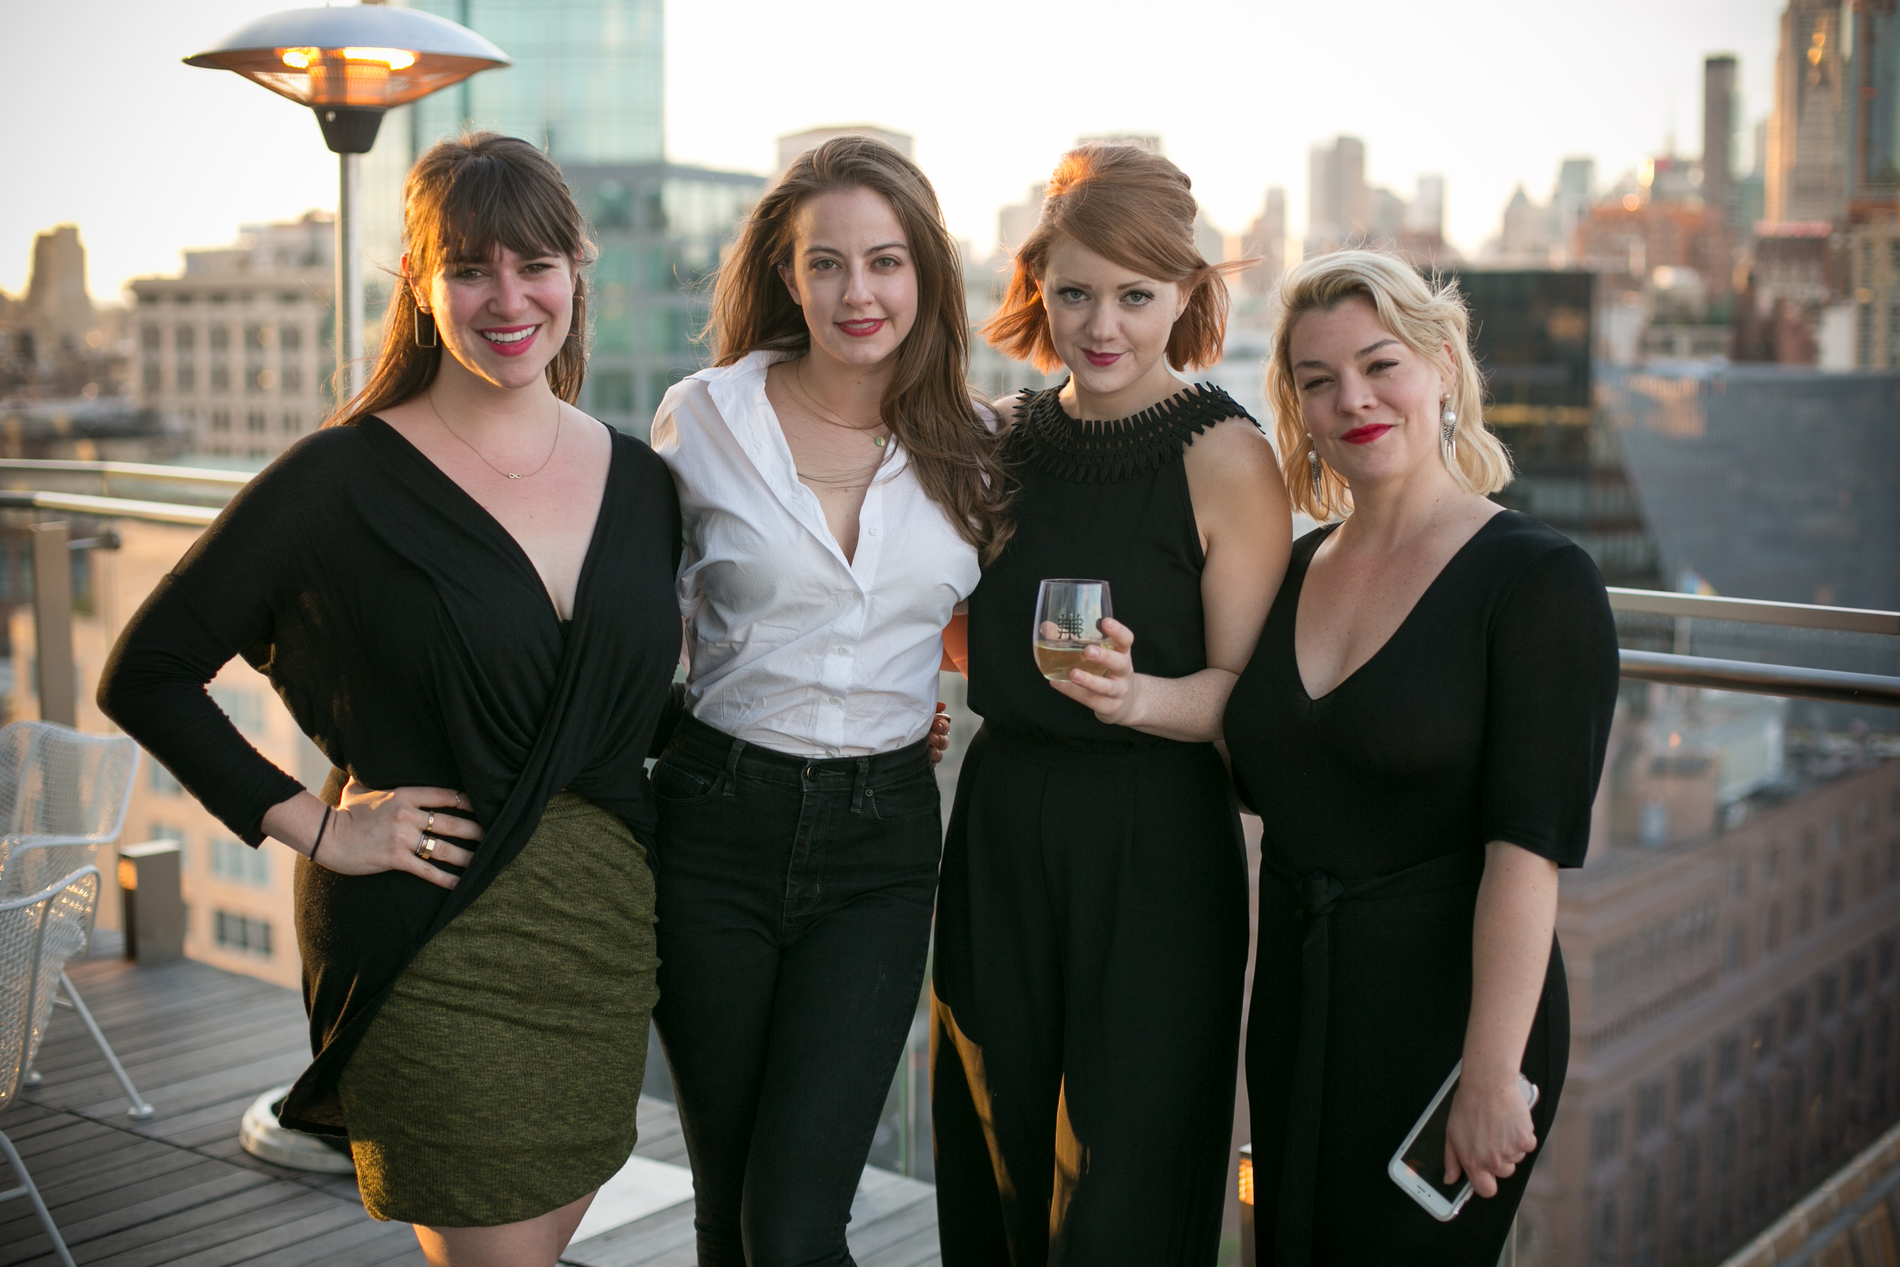 Filmmakers at Lower East Side Film Fest 2016